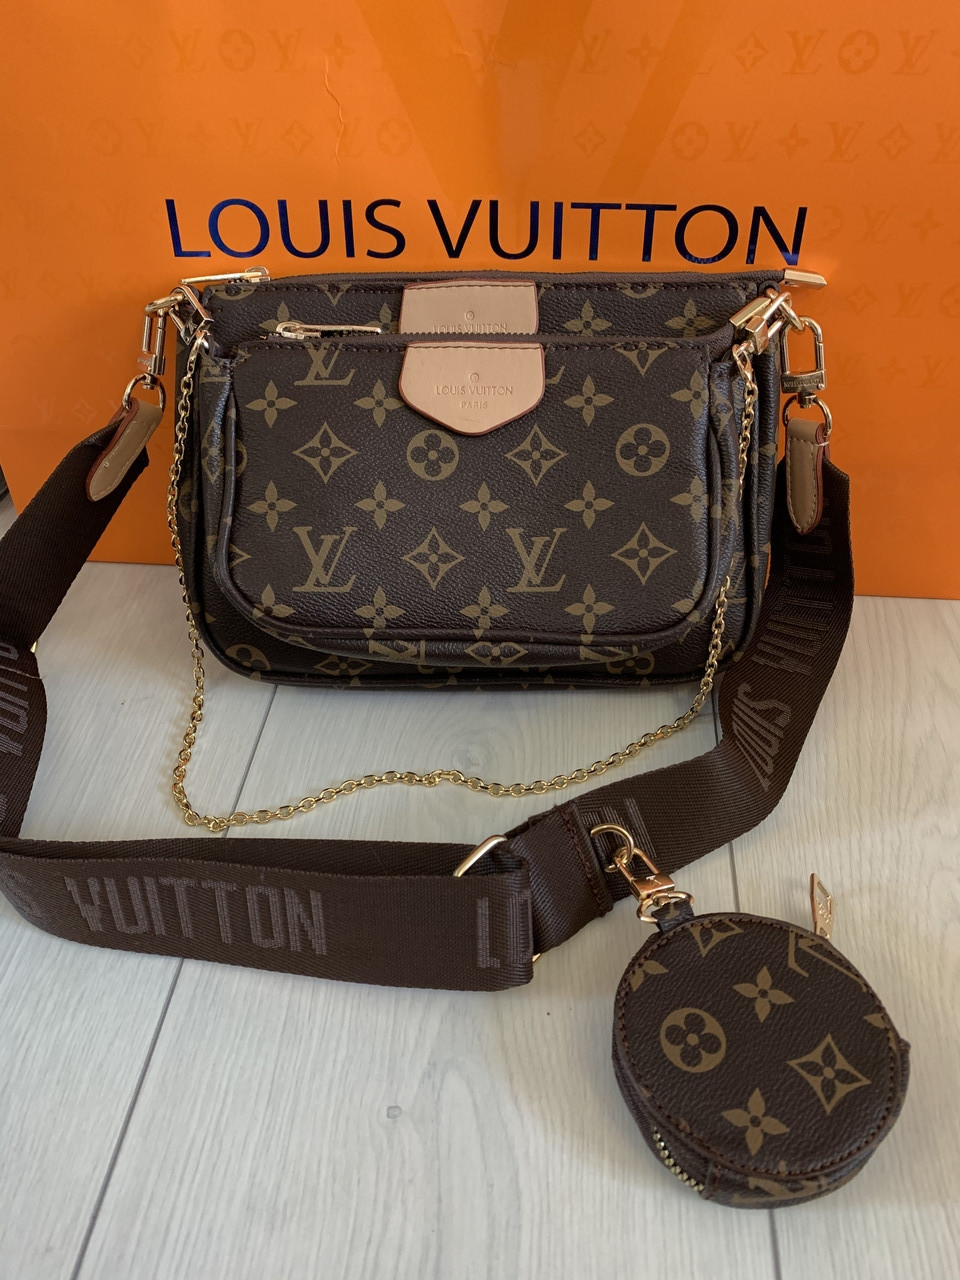 Женская Сумка  Louis Vuitton Multi Pochette реплика Луи Виттон зеркало, коричневый ремешок